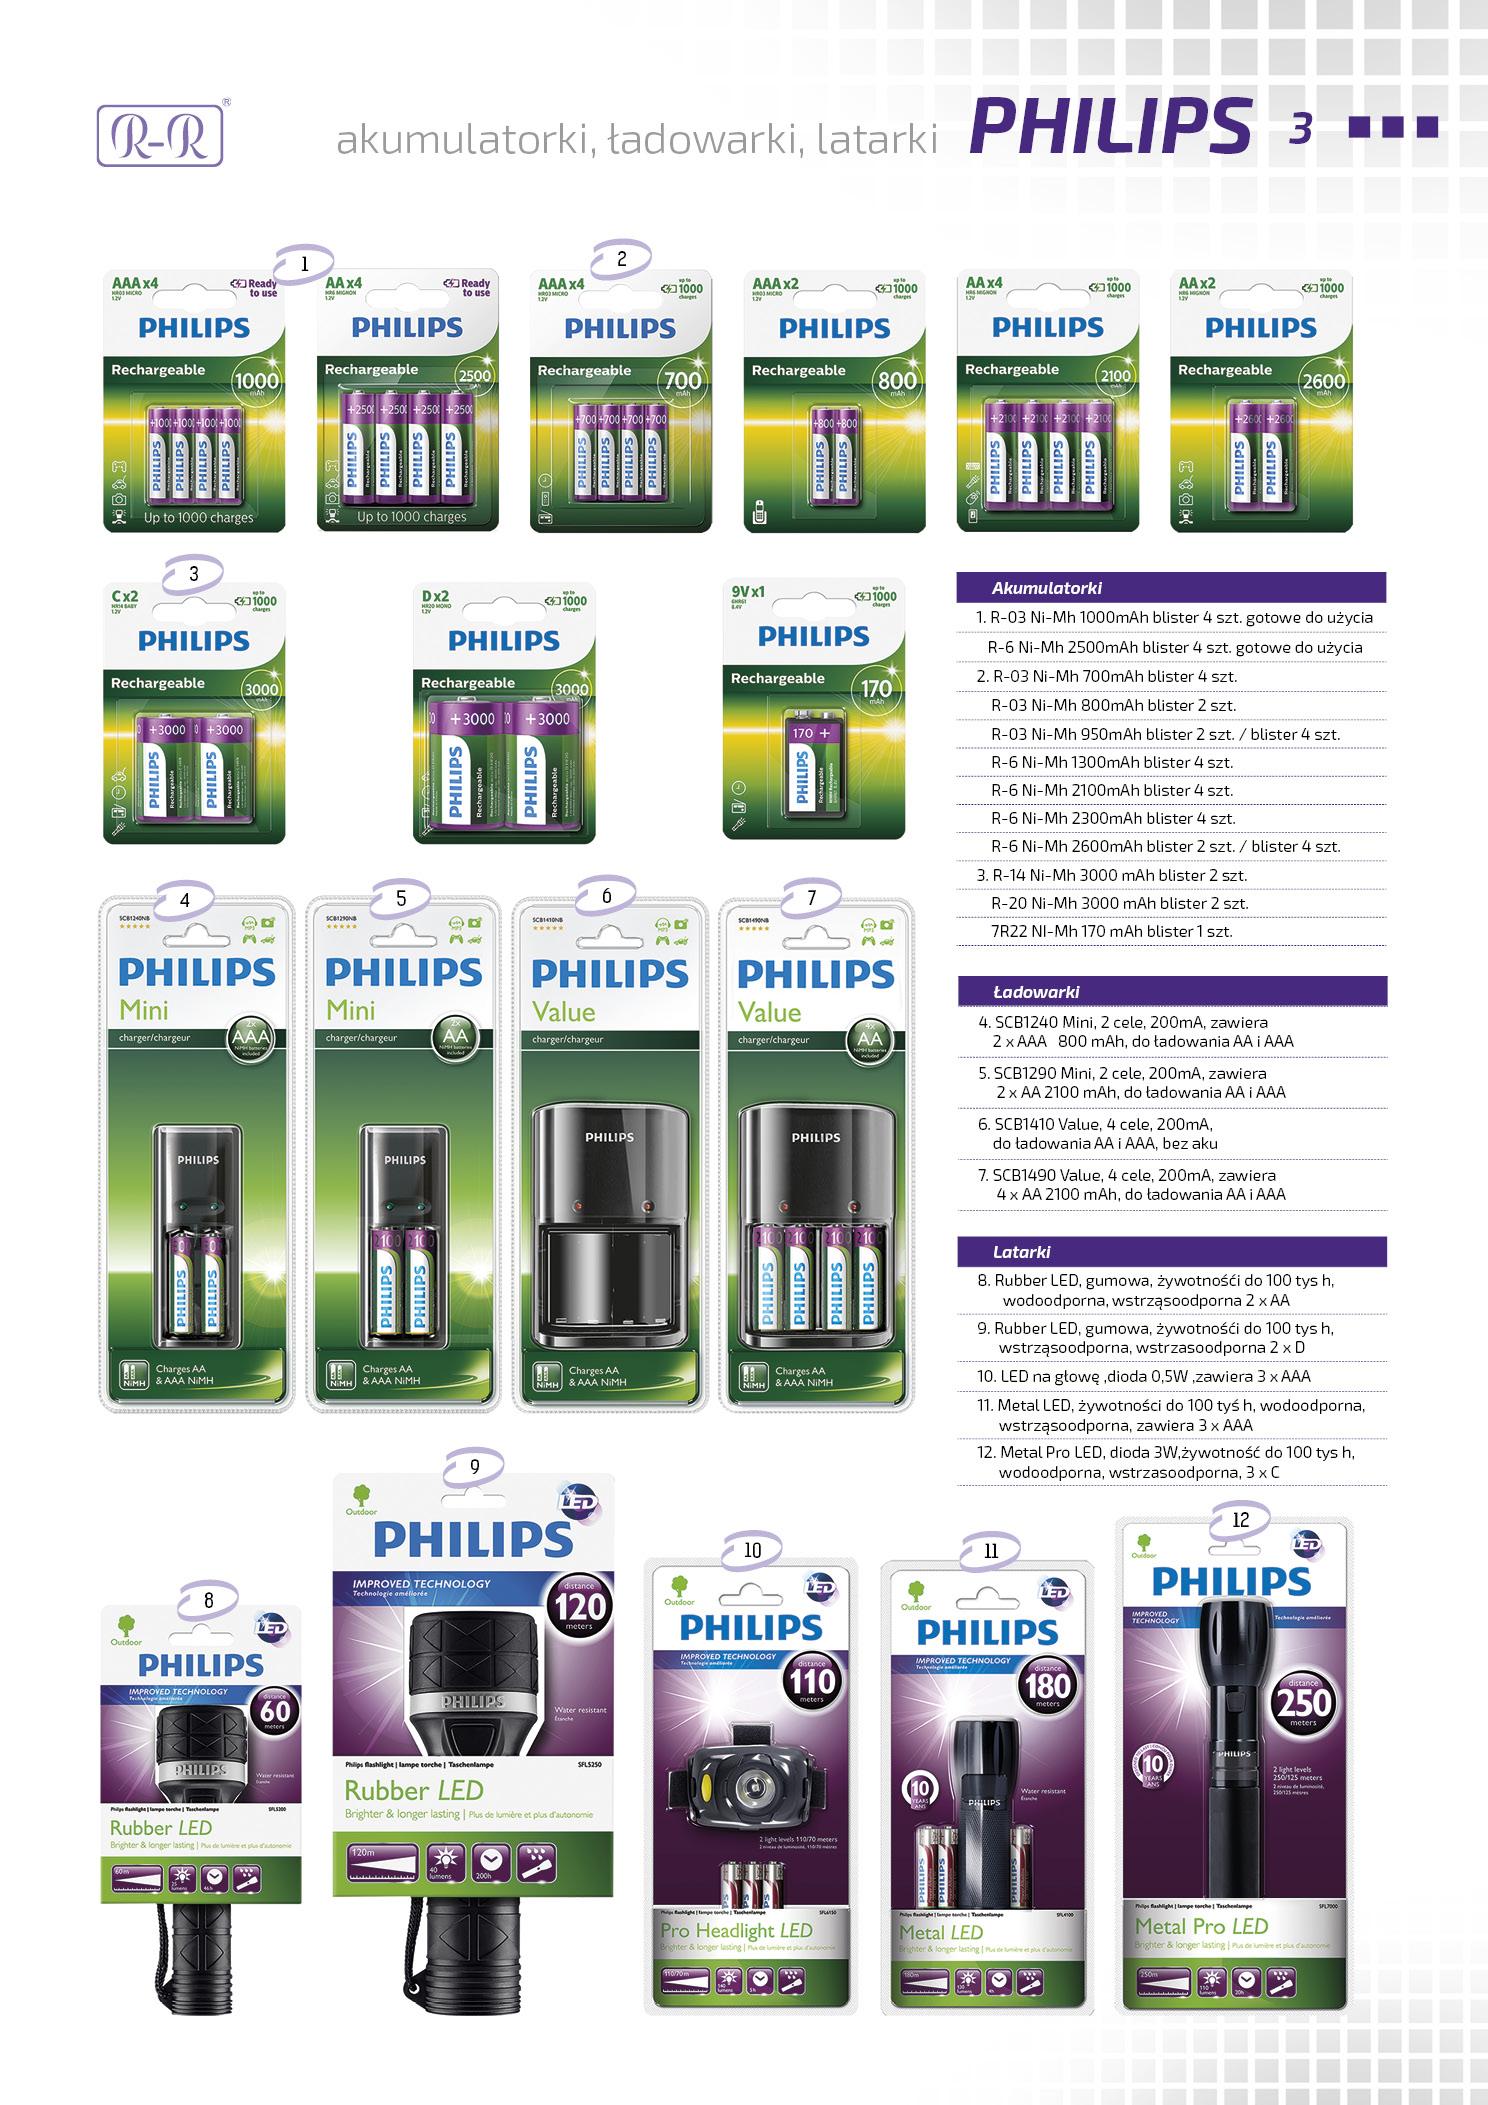 Philips Akumulatory, ładowarki, latarki